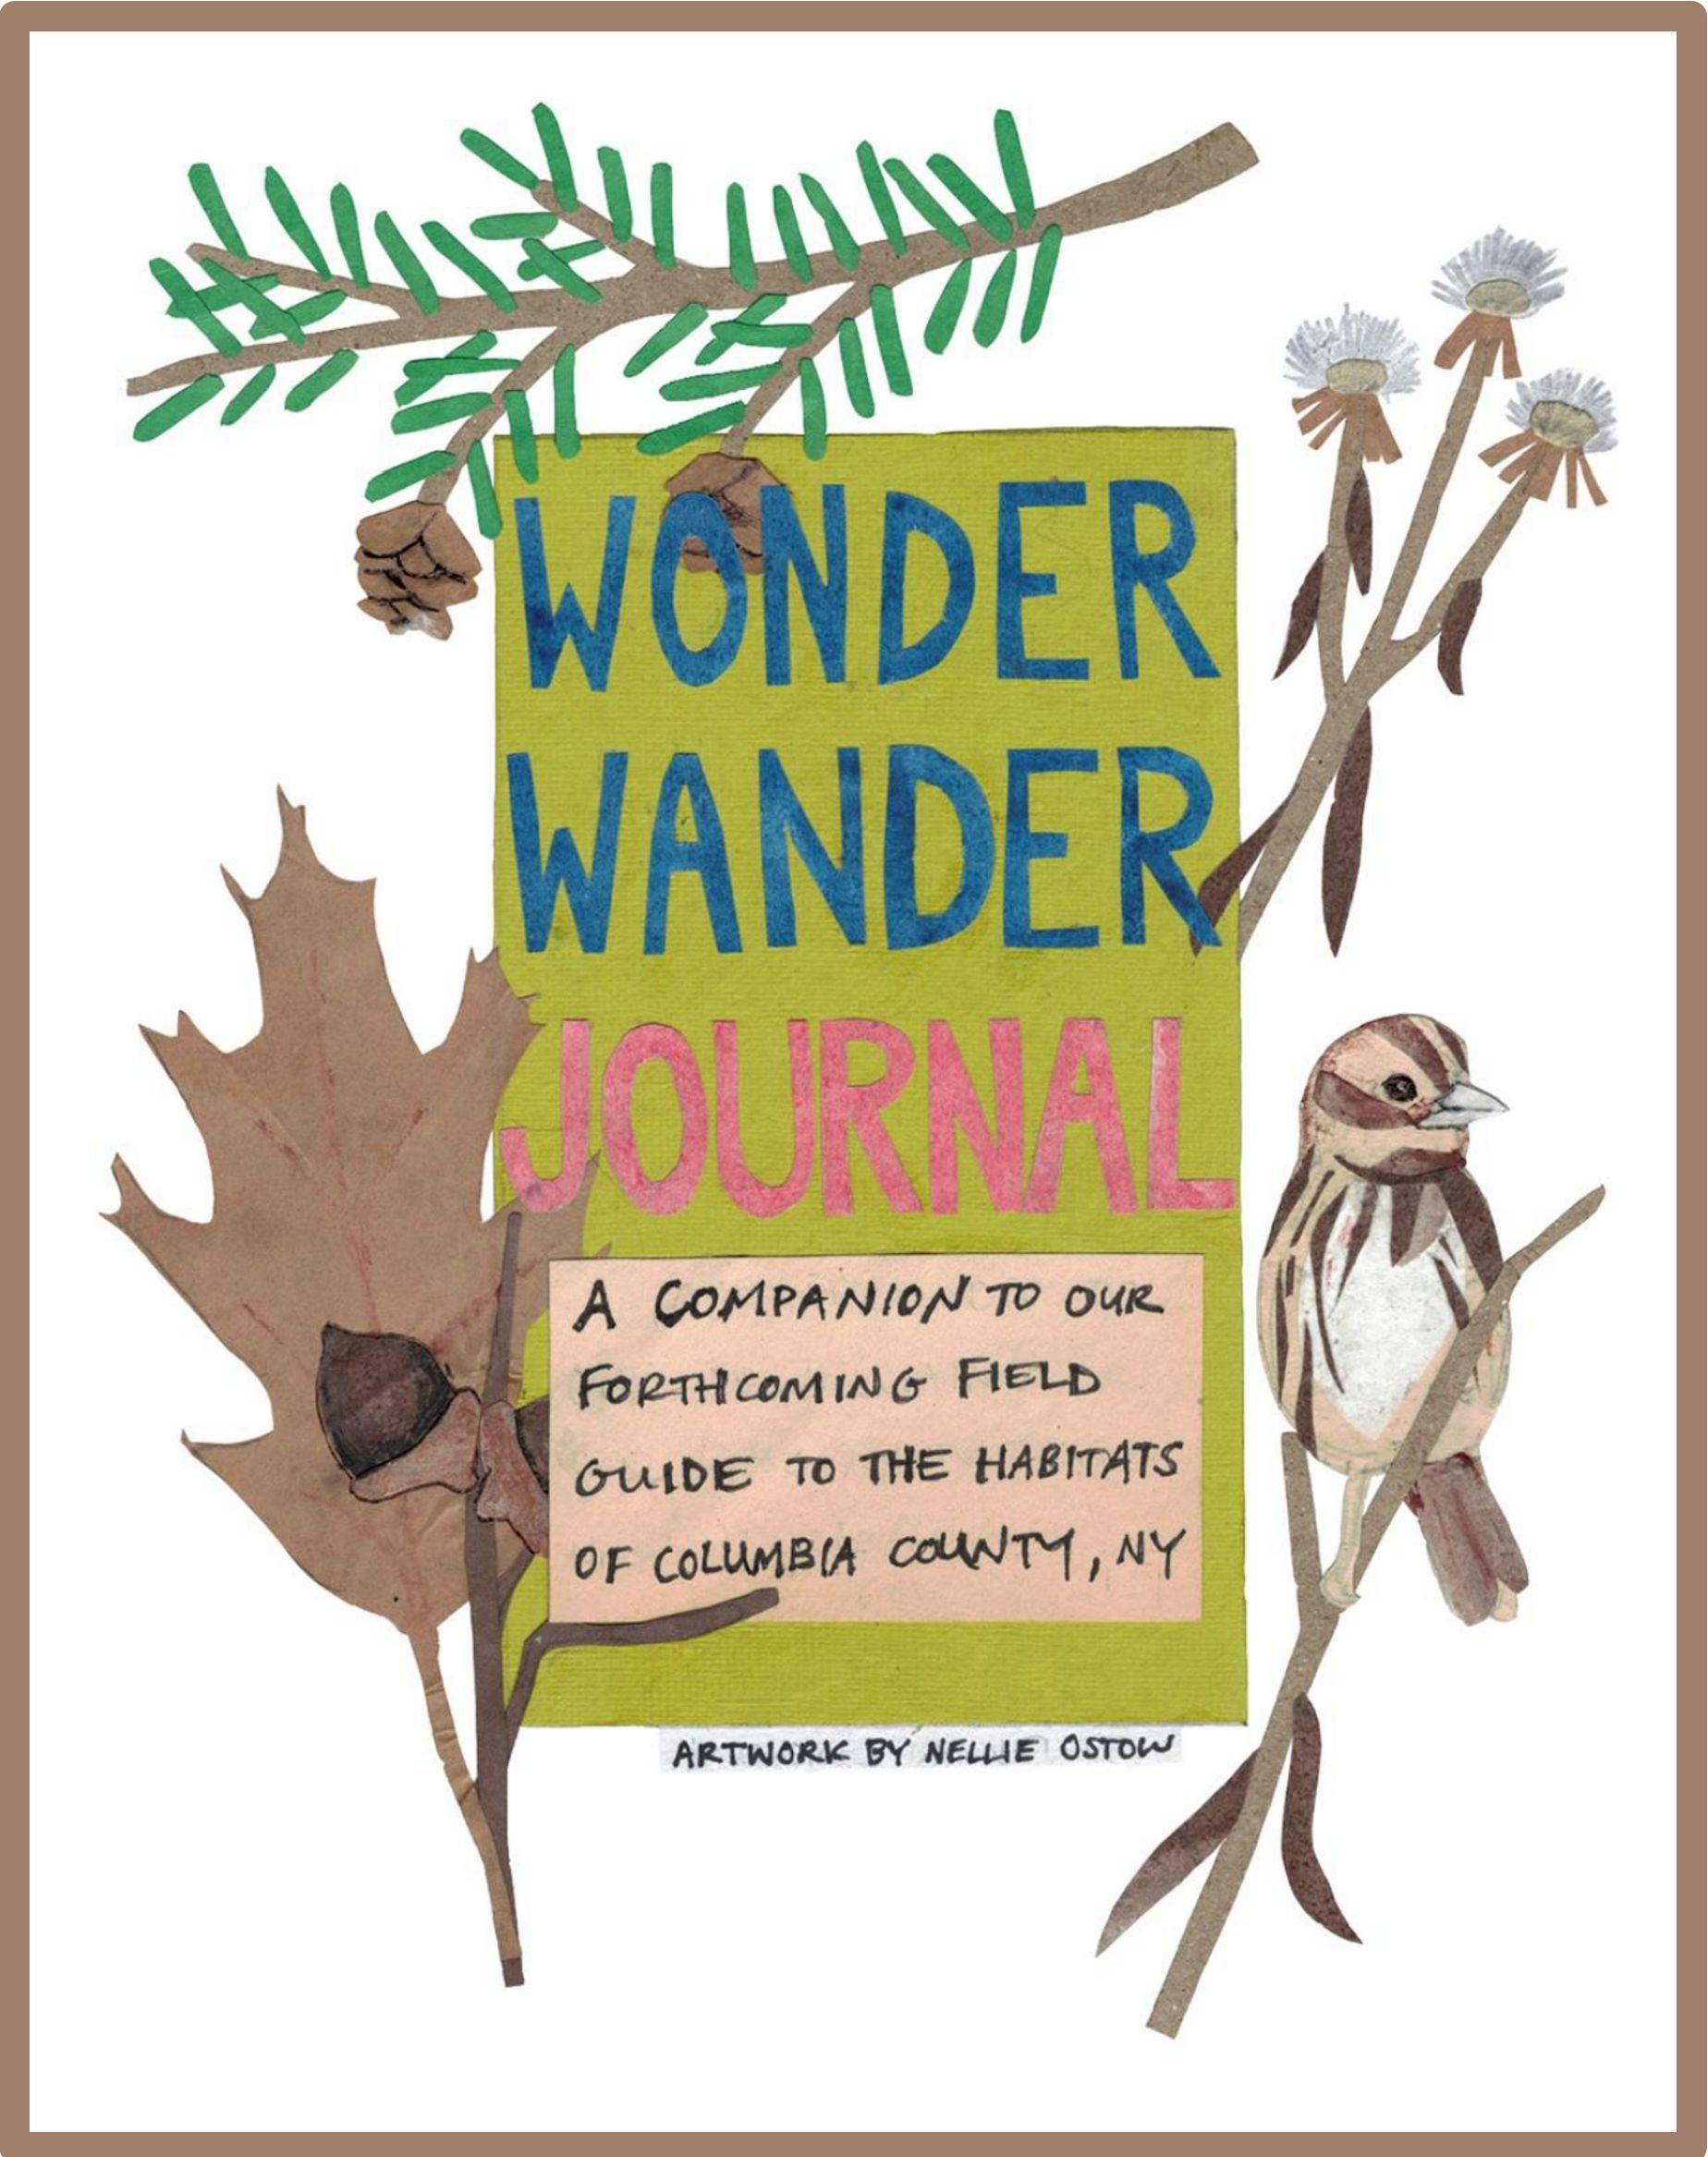 Wonder Wander journal cover